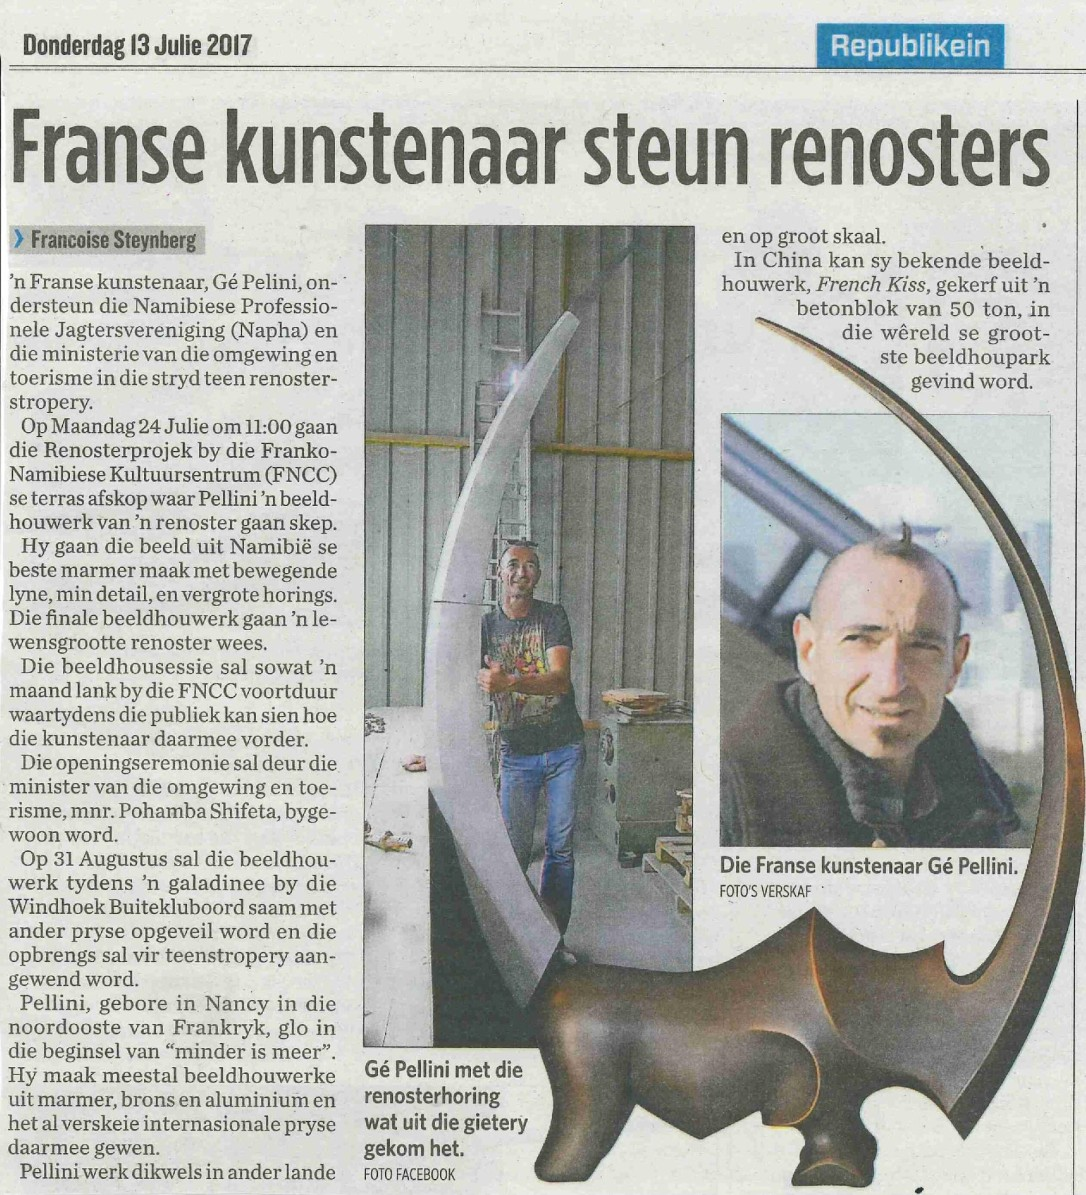 20170713 - Republikein - Franse kunstenaar steun renosters-page-001.jpg